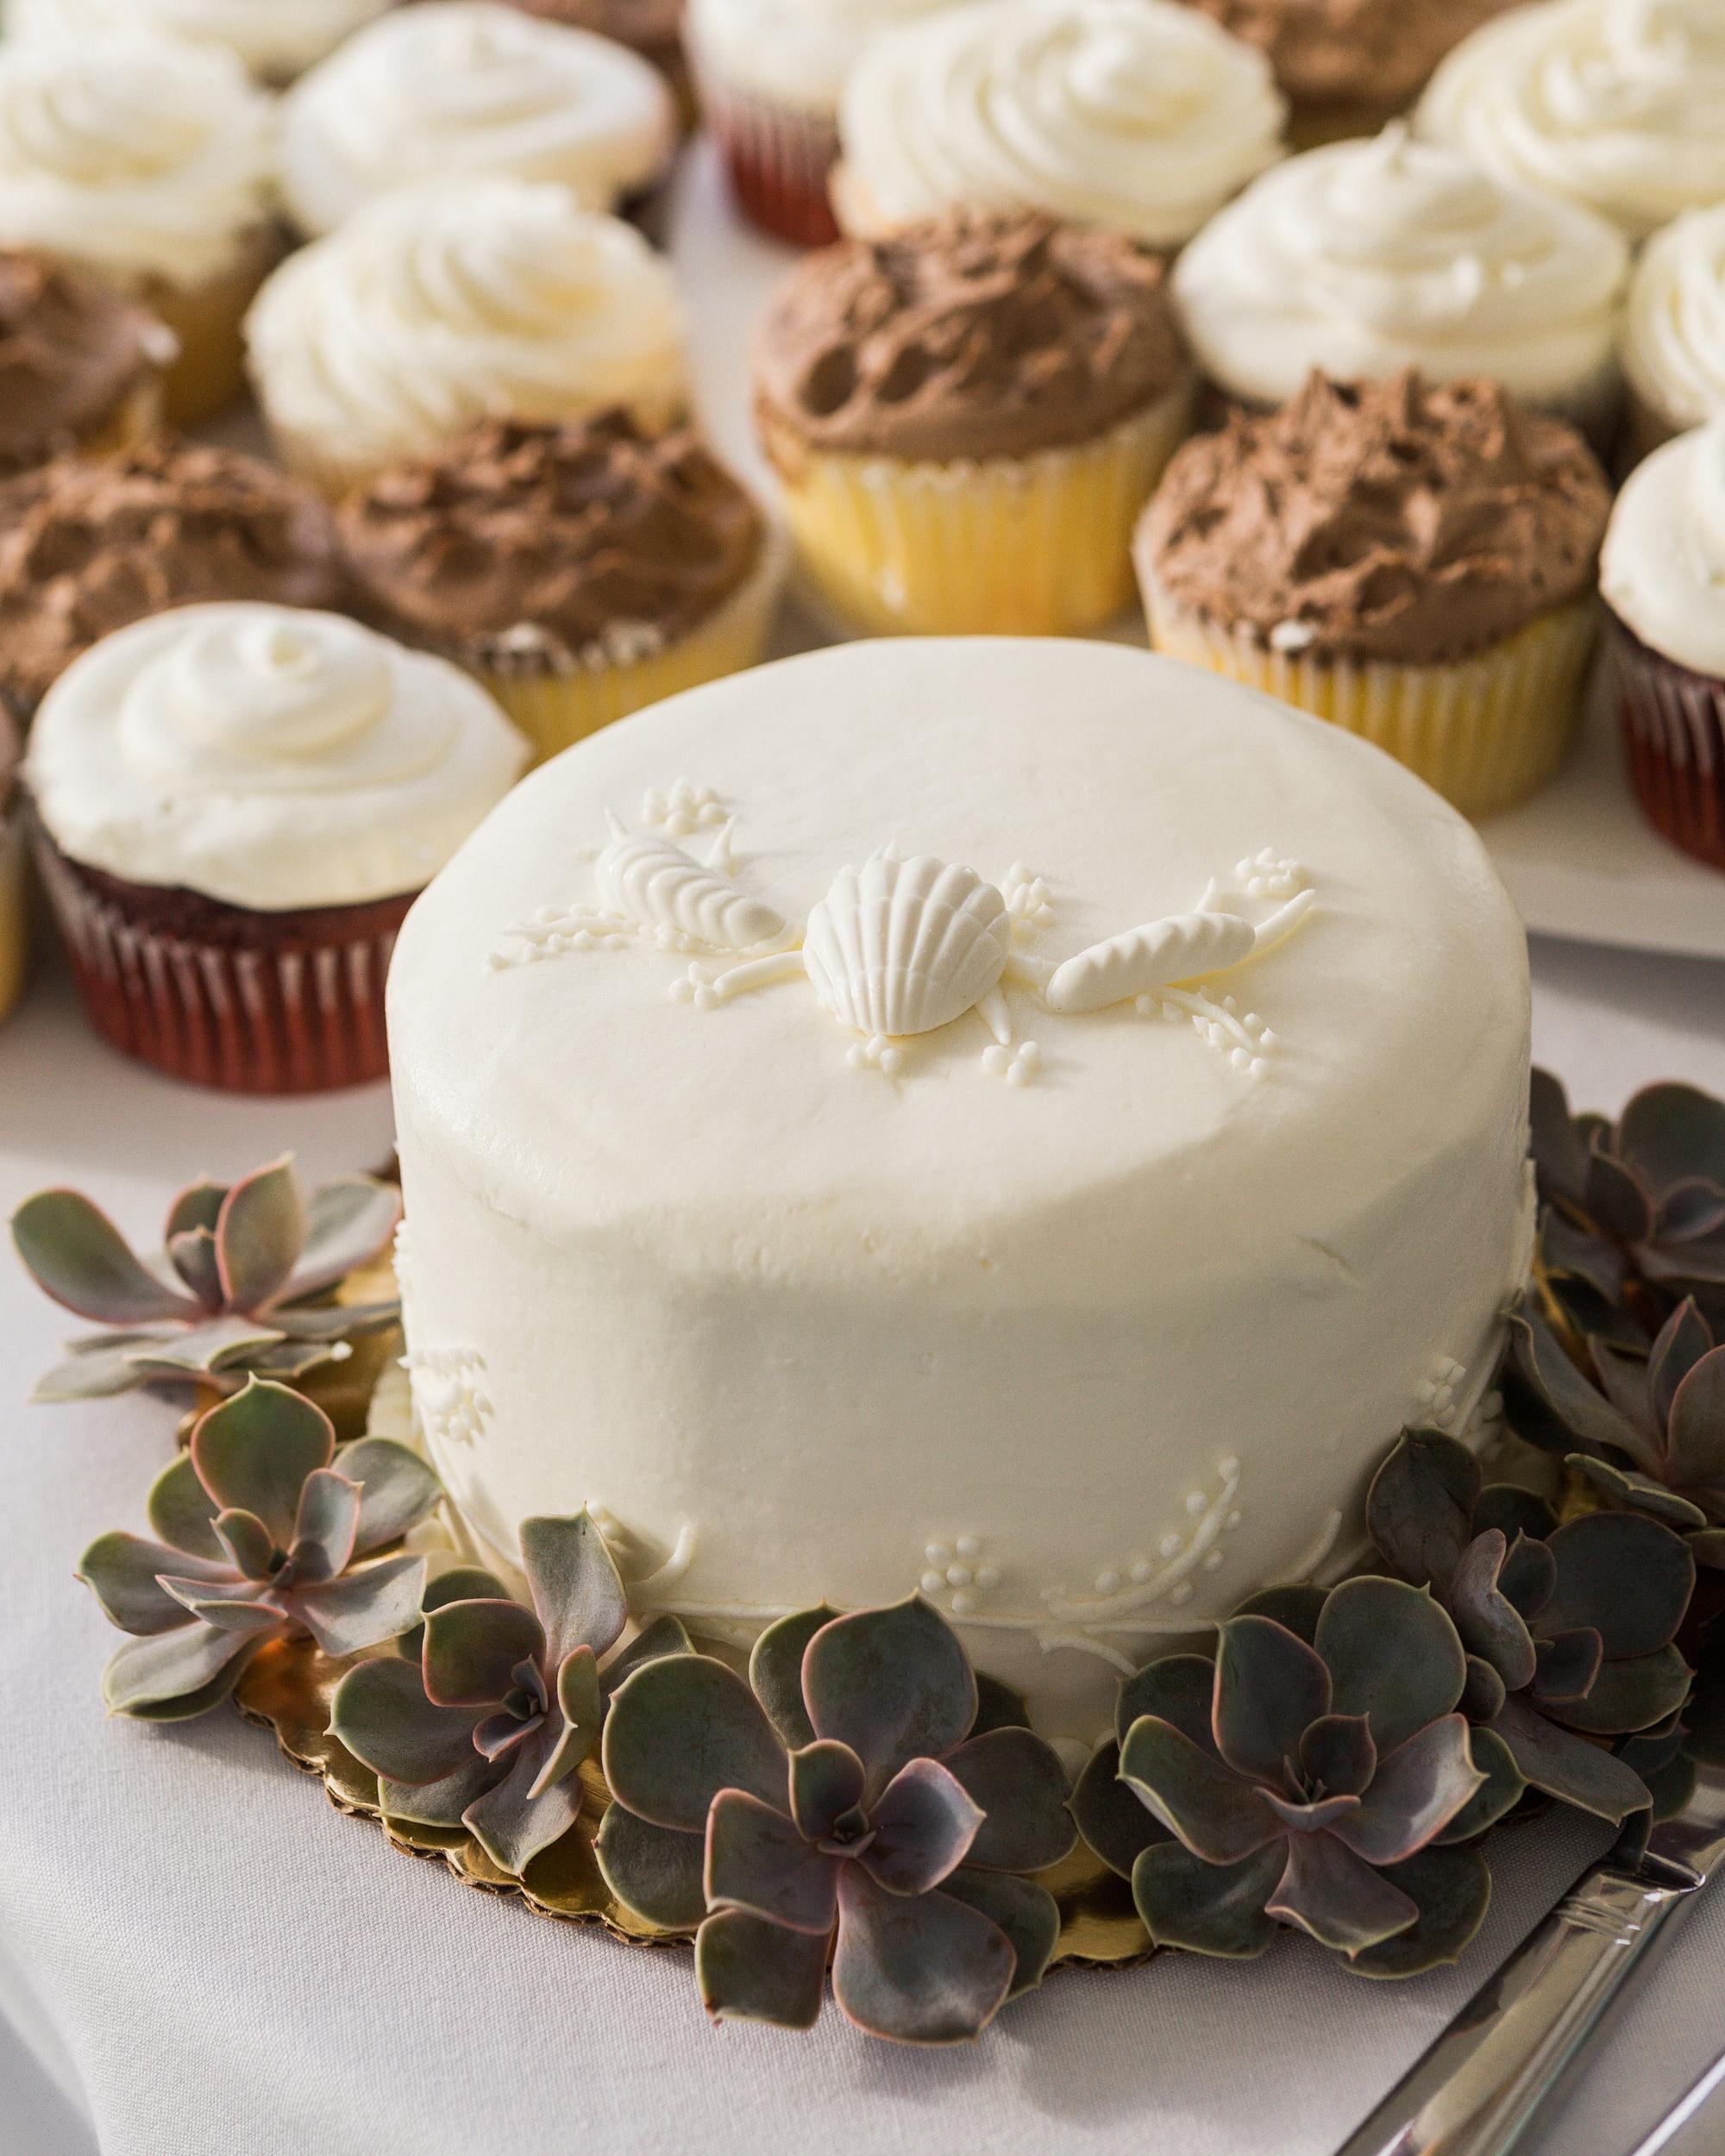 emily-justin-wedding-cape-cod-584-s111843-cakes-1215.jpg